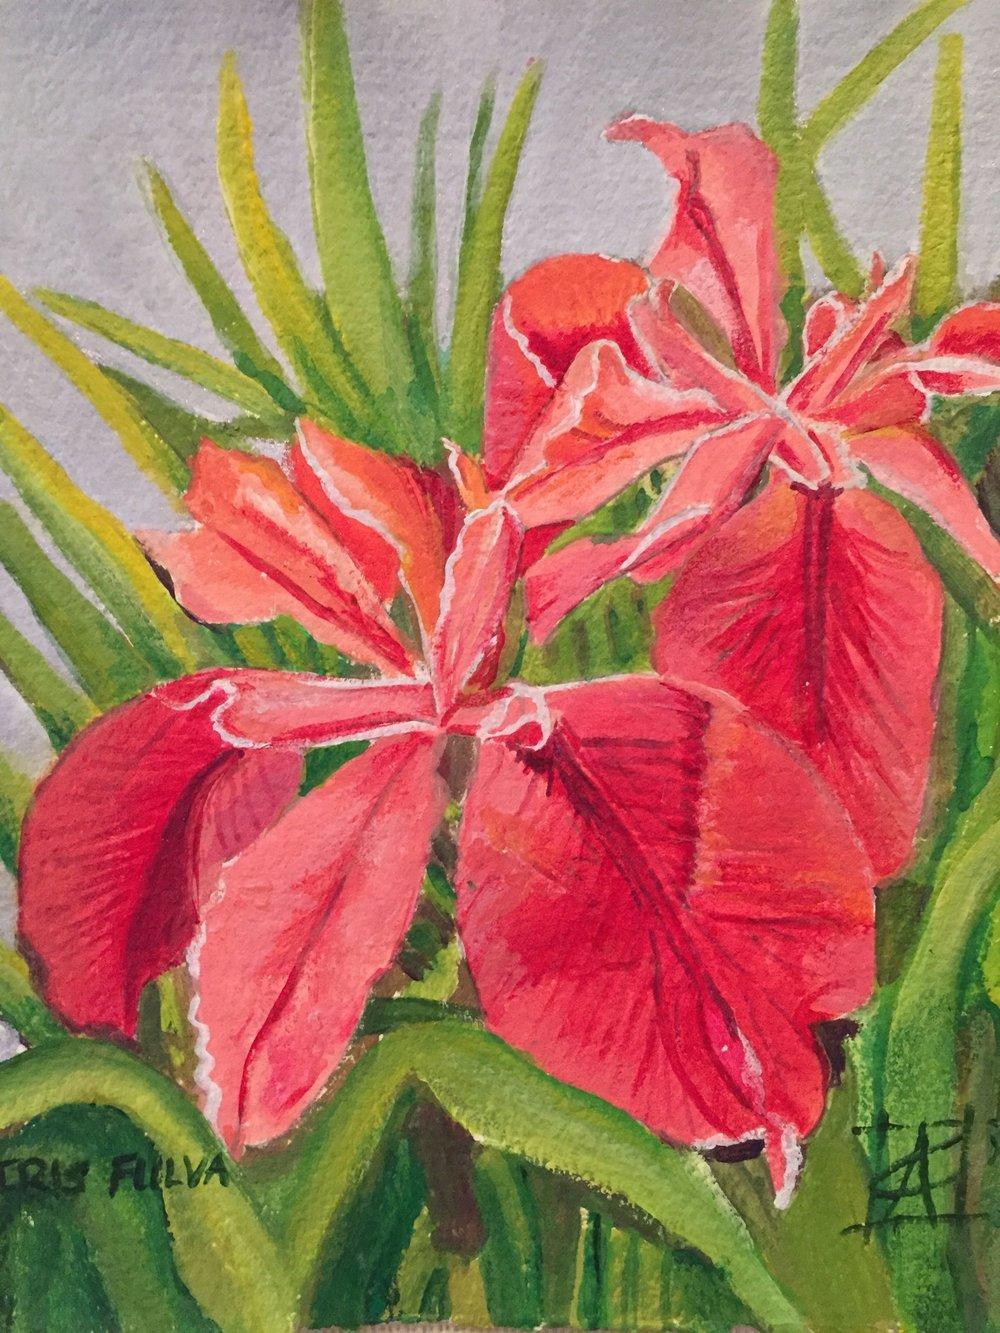 "Iris fulva2016acrylic on paper 10x10"" $500"